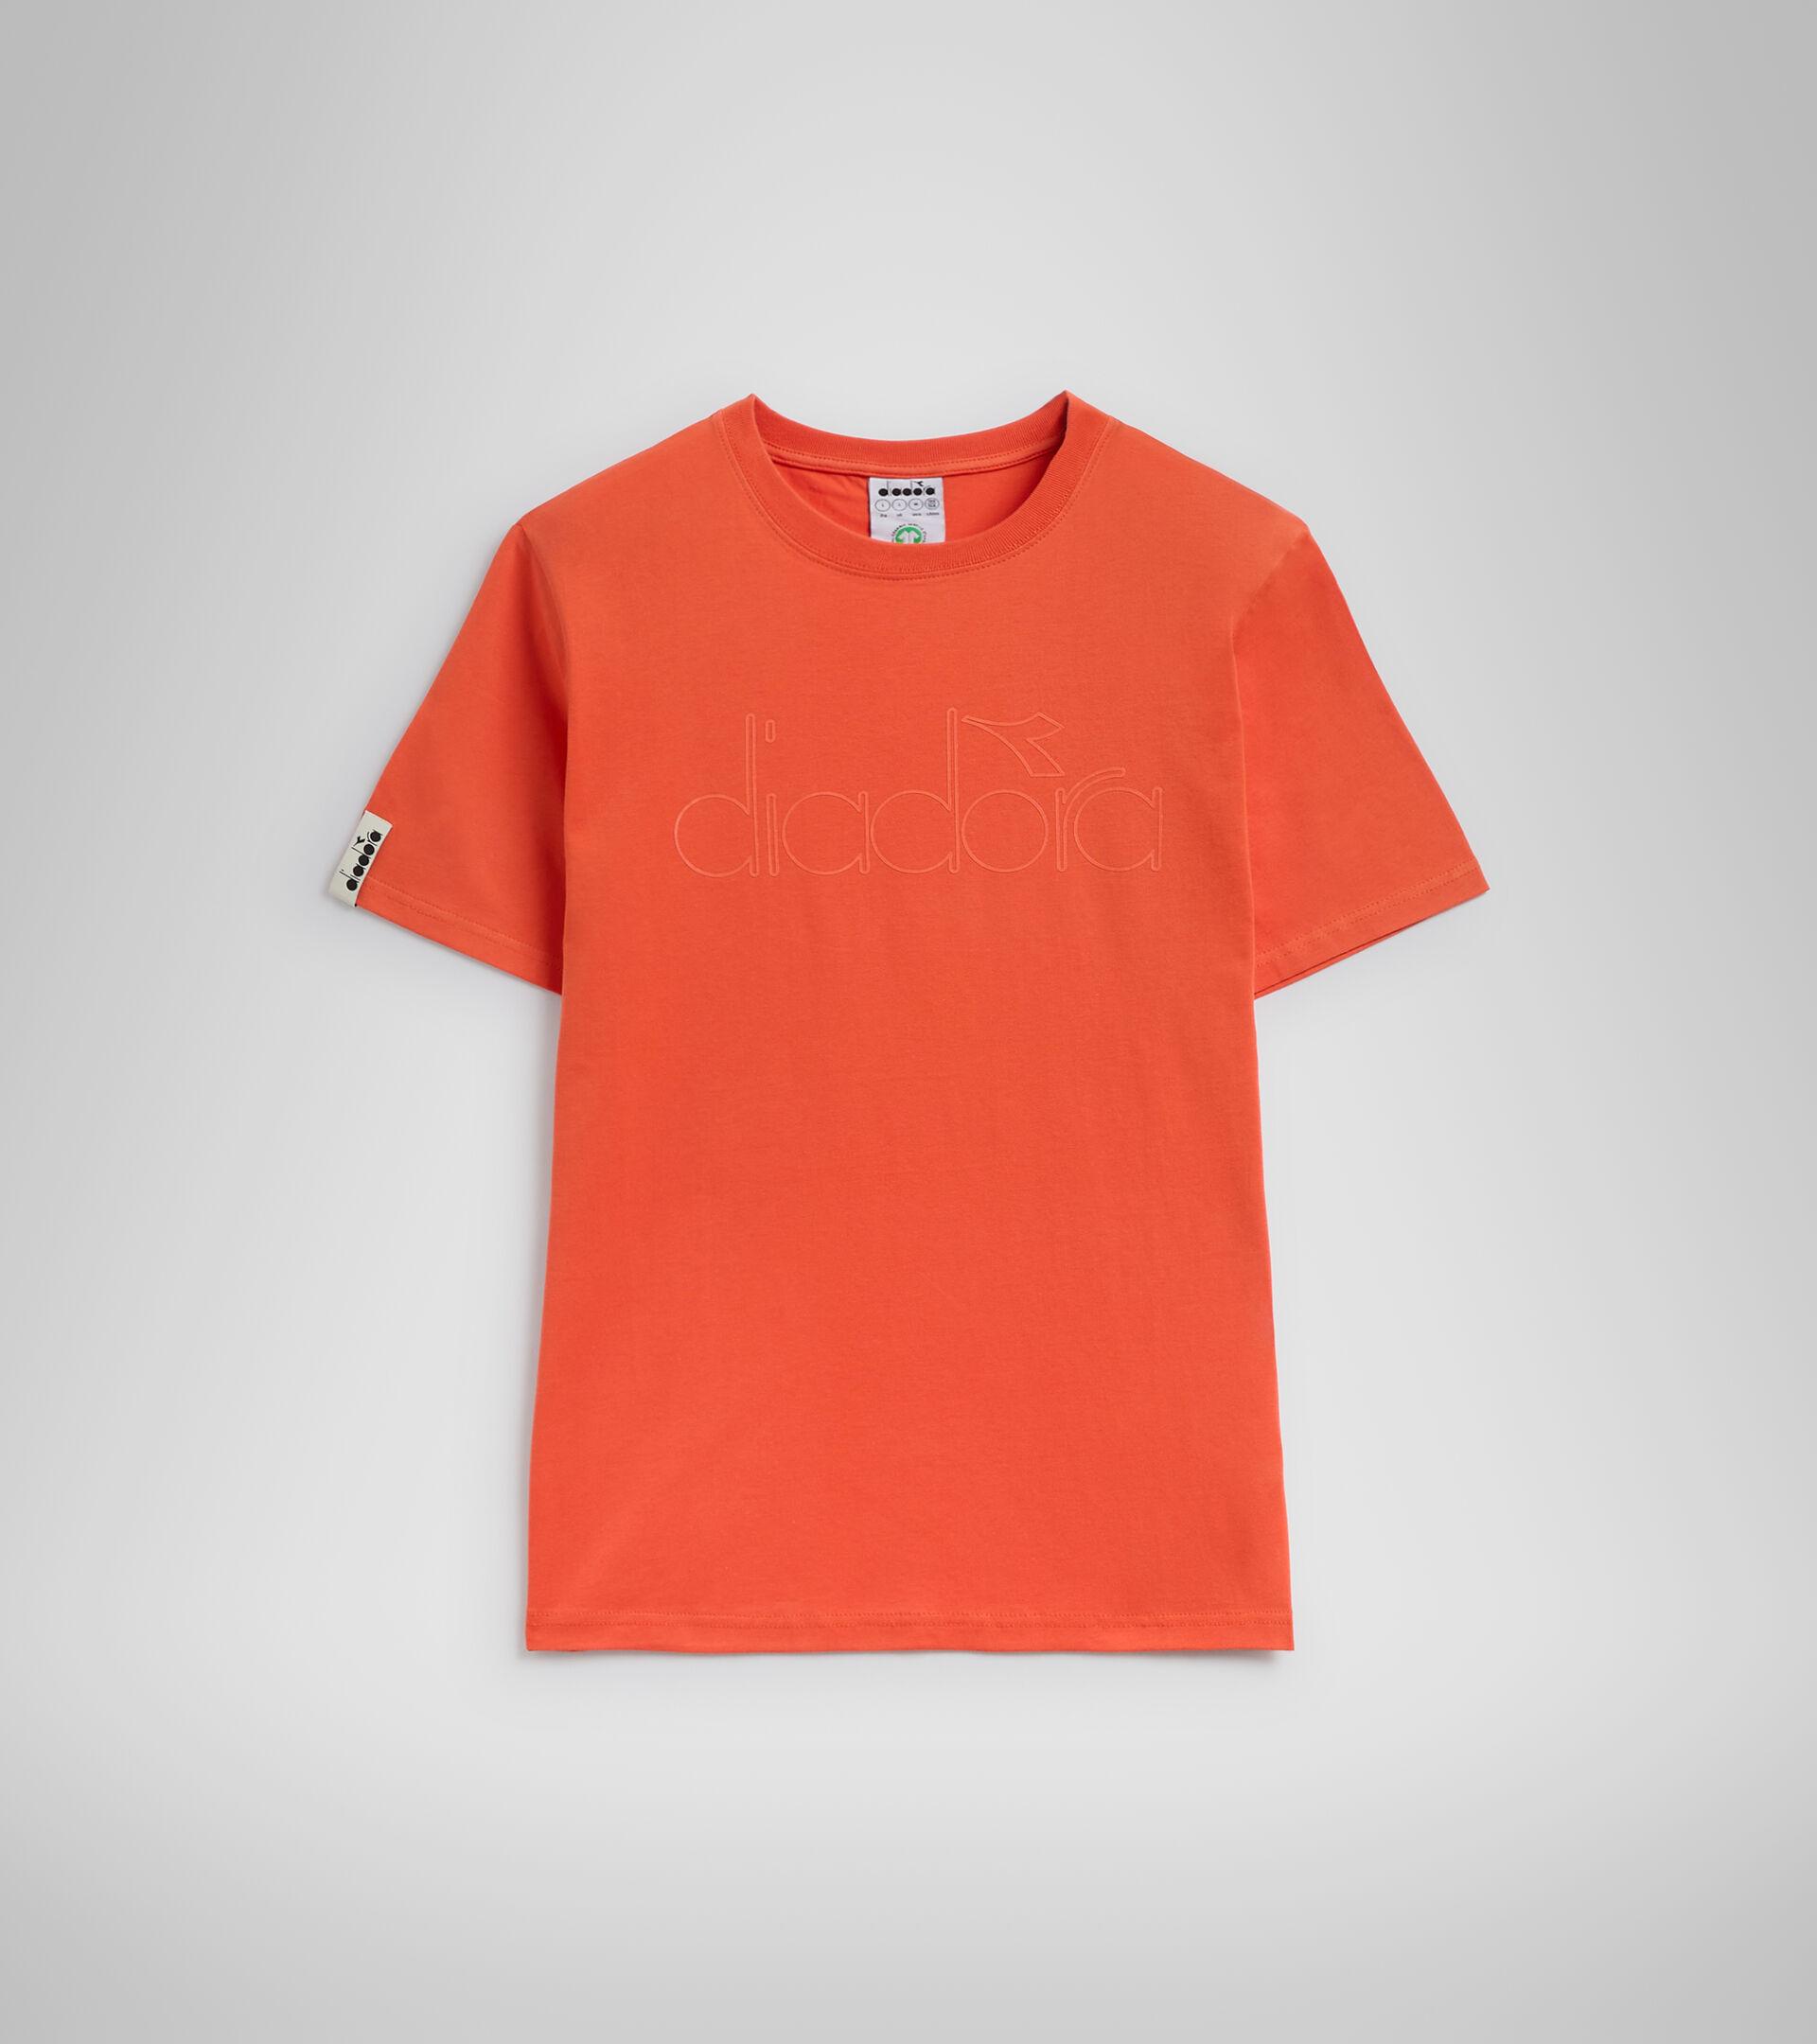 Camiseta - Unisex T-SHIRT SS DIADORA HD ROJO LIRIO ATIGRADO - Diadora